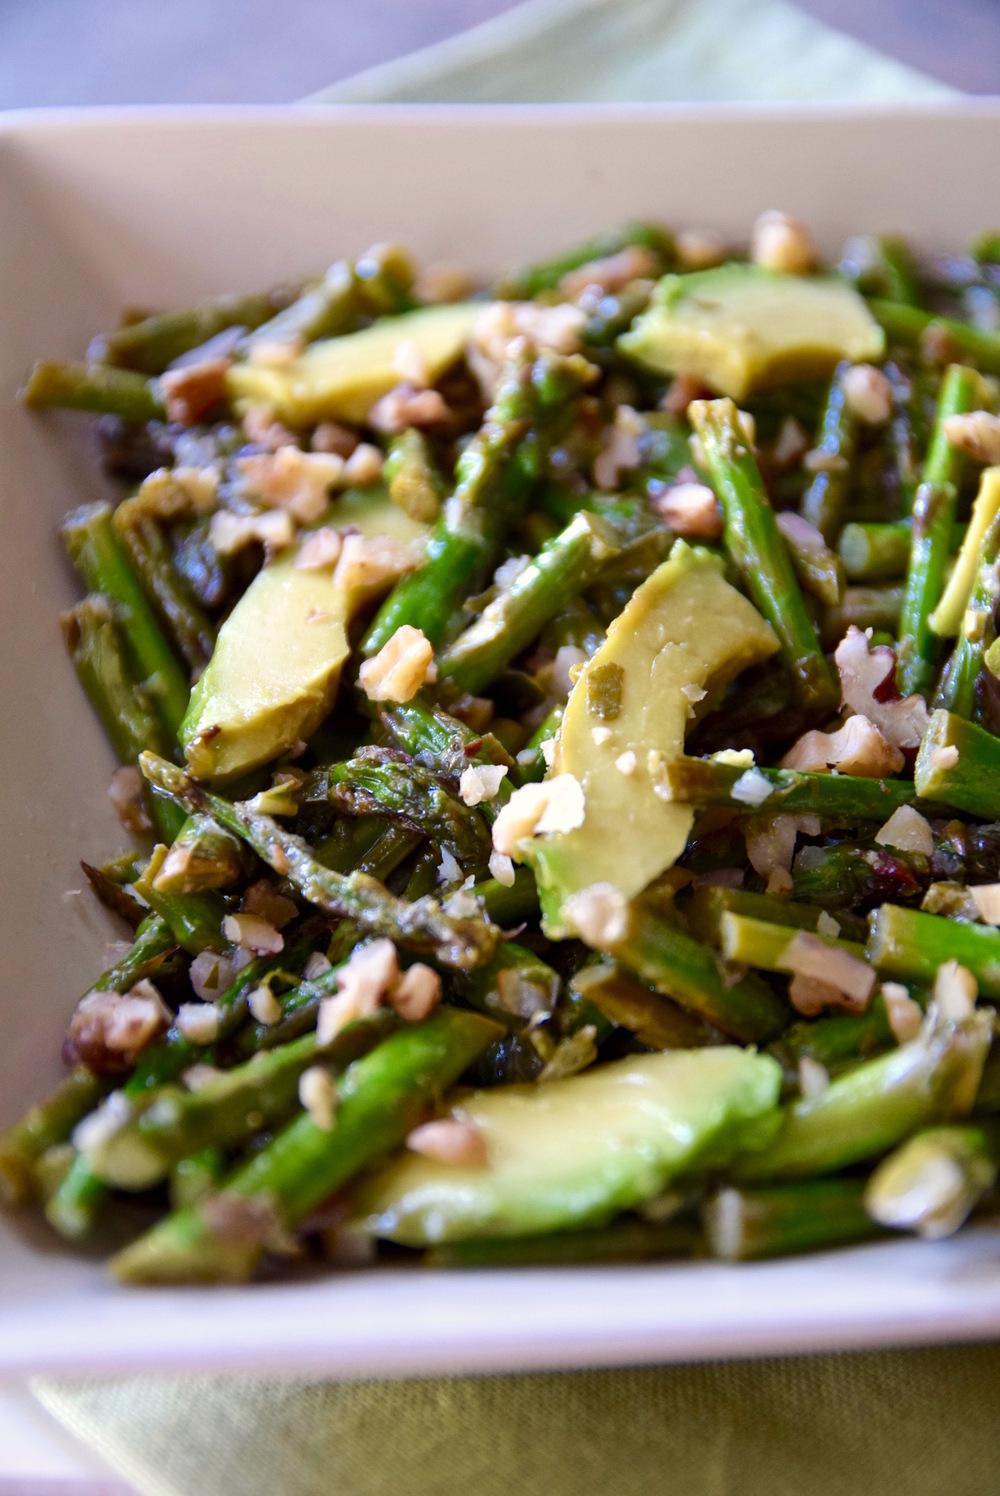 Asparagus Avocado Salad with Walnut Vinaigrette — Tasting Page